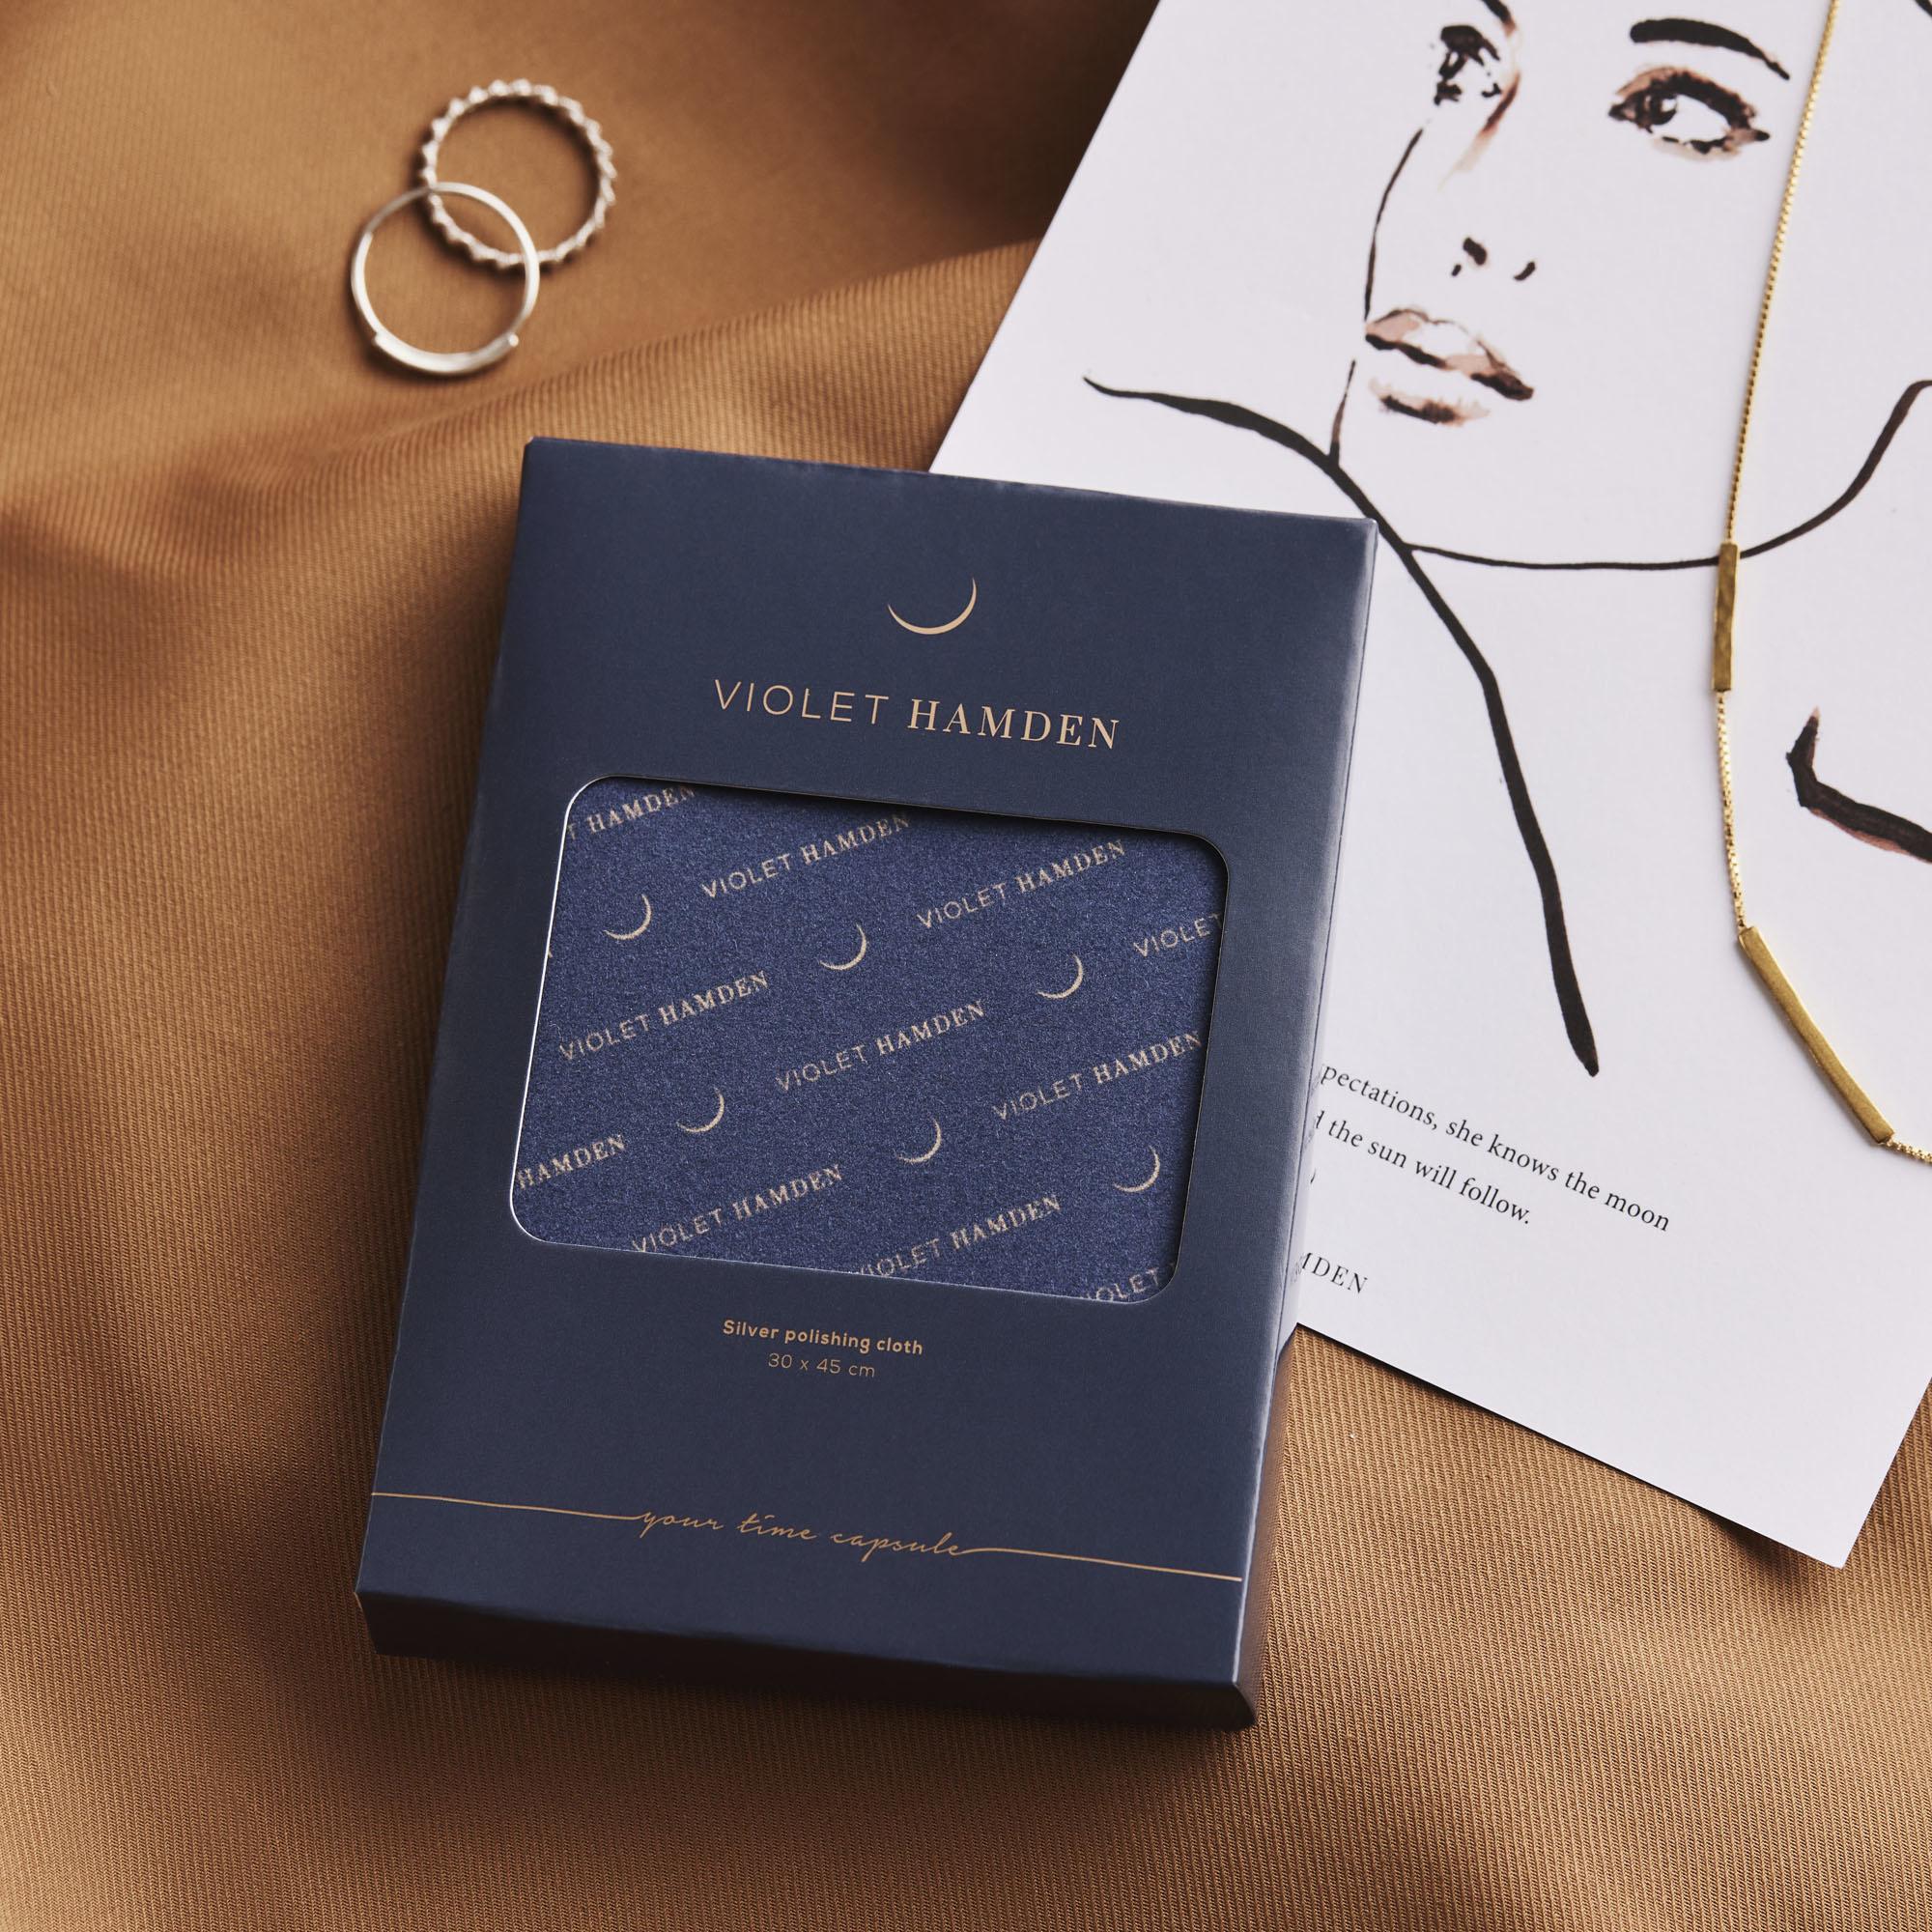 Violet Hamden Polishing cloth for silver jewellery